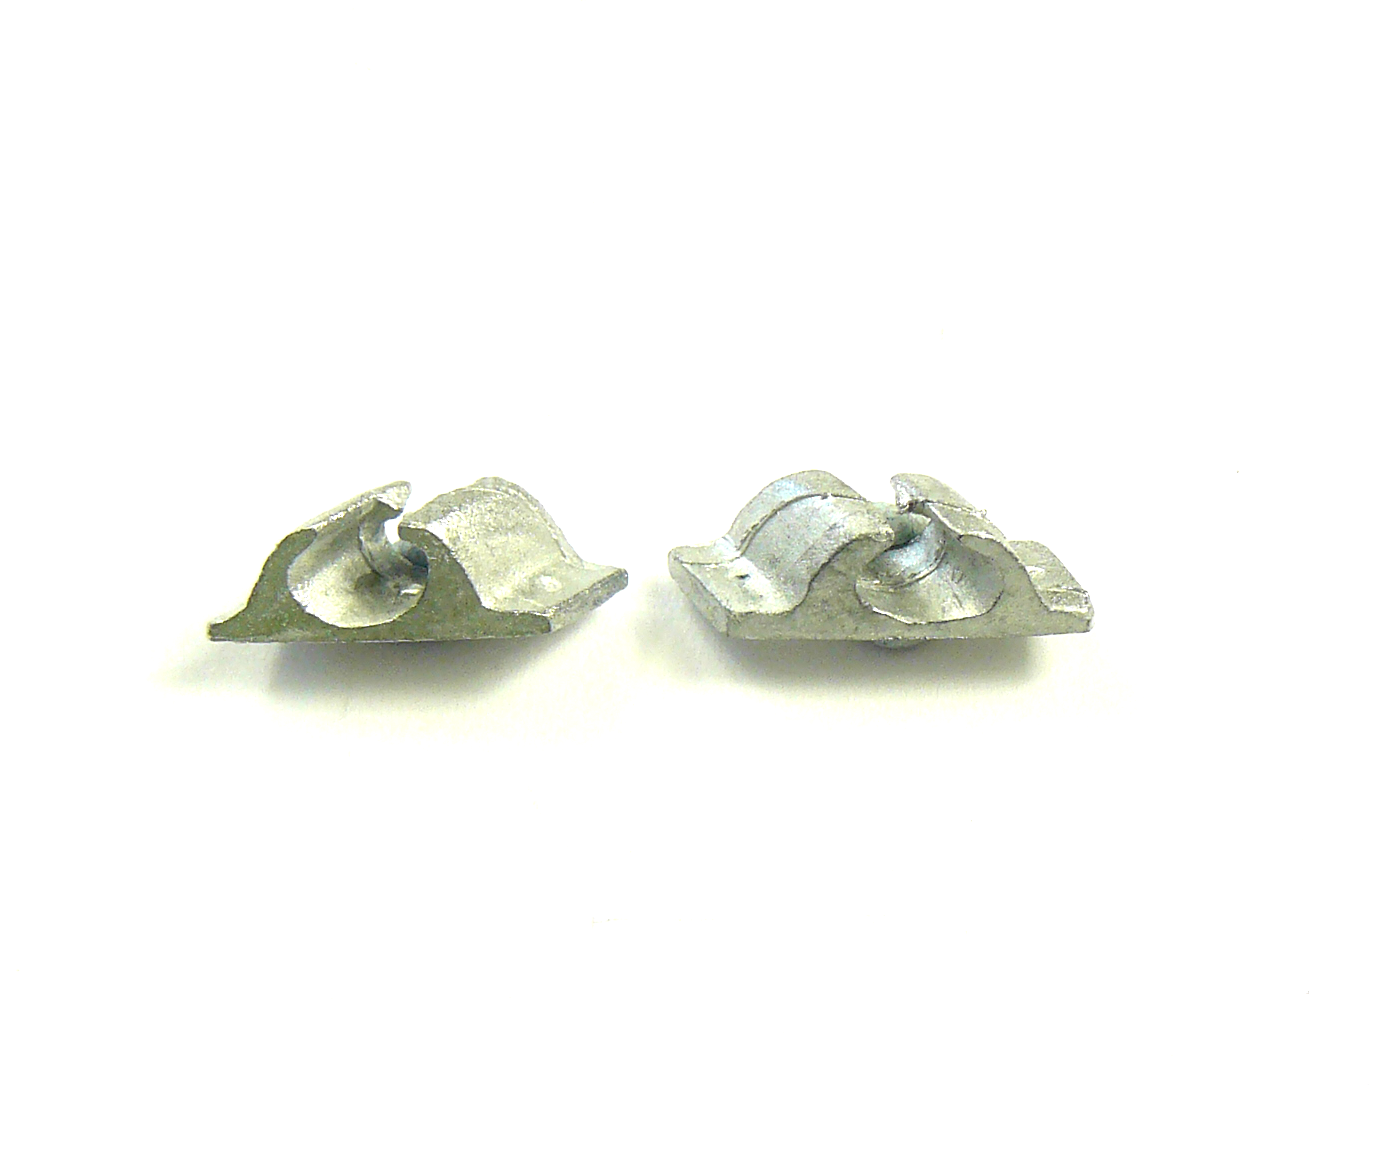 4 x White Metal Angle Fairlead 18mm